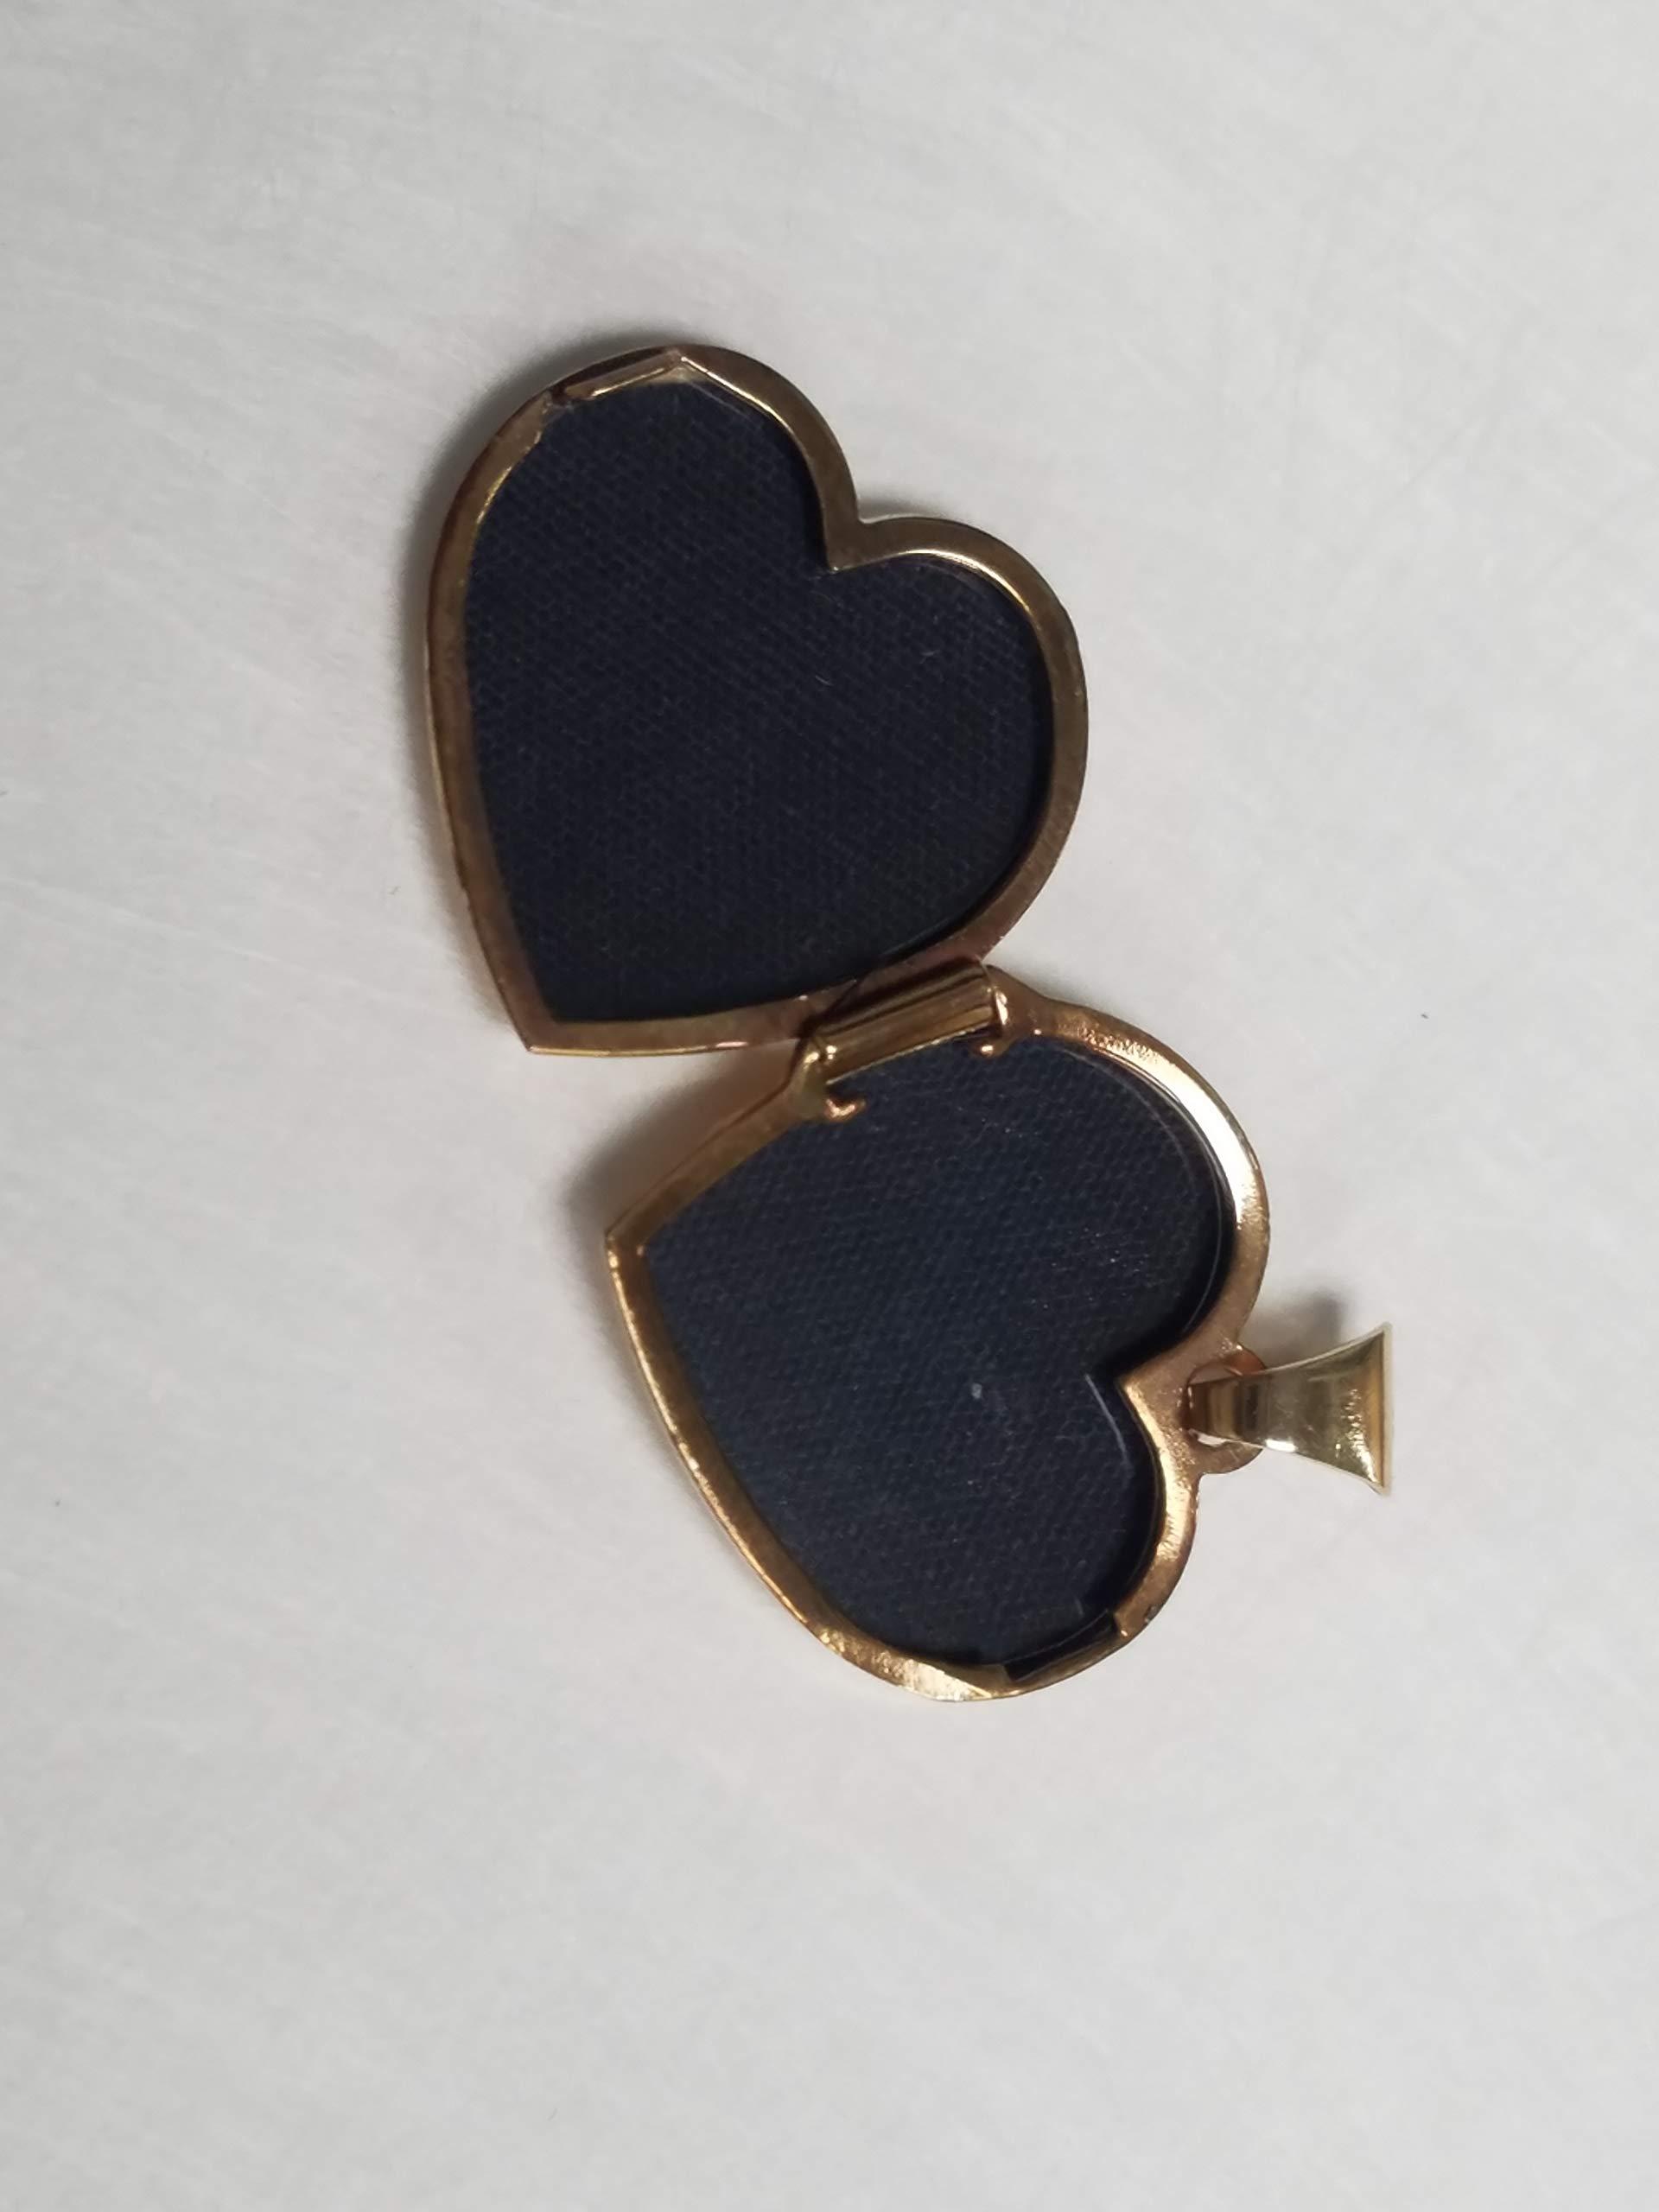 14 Karat Yellow Gold Two Photo Heart Locket